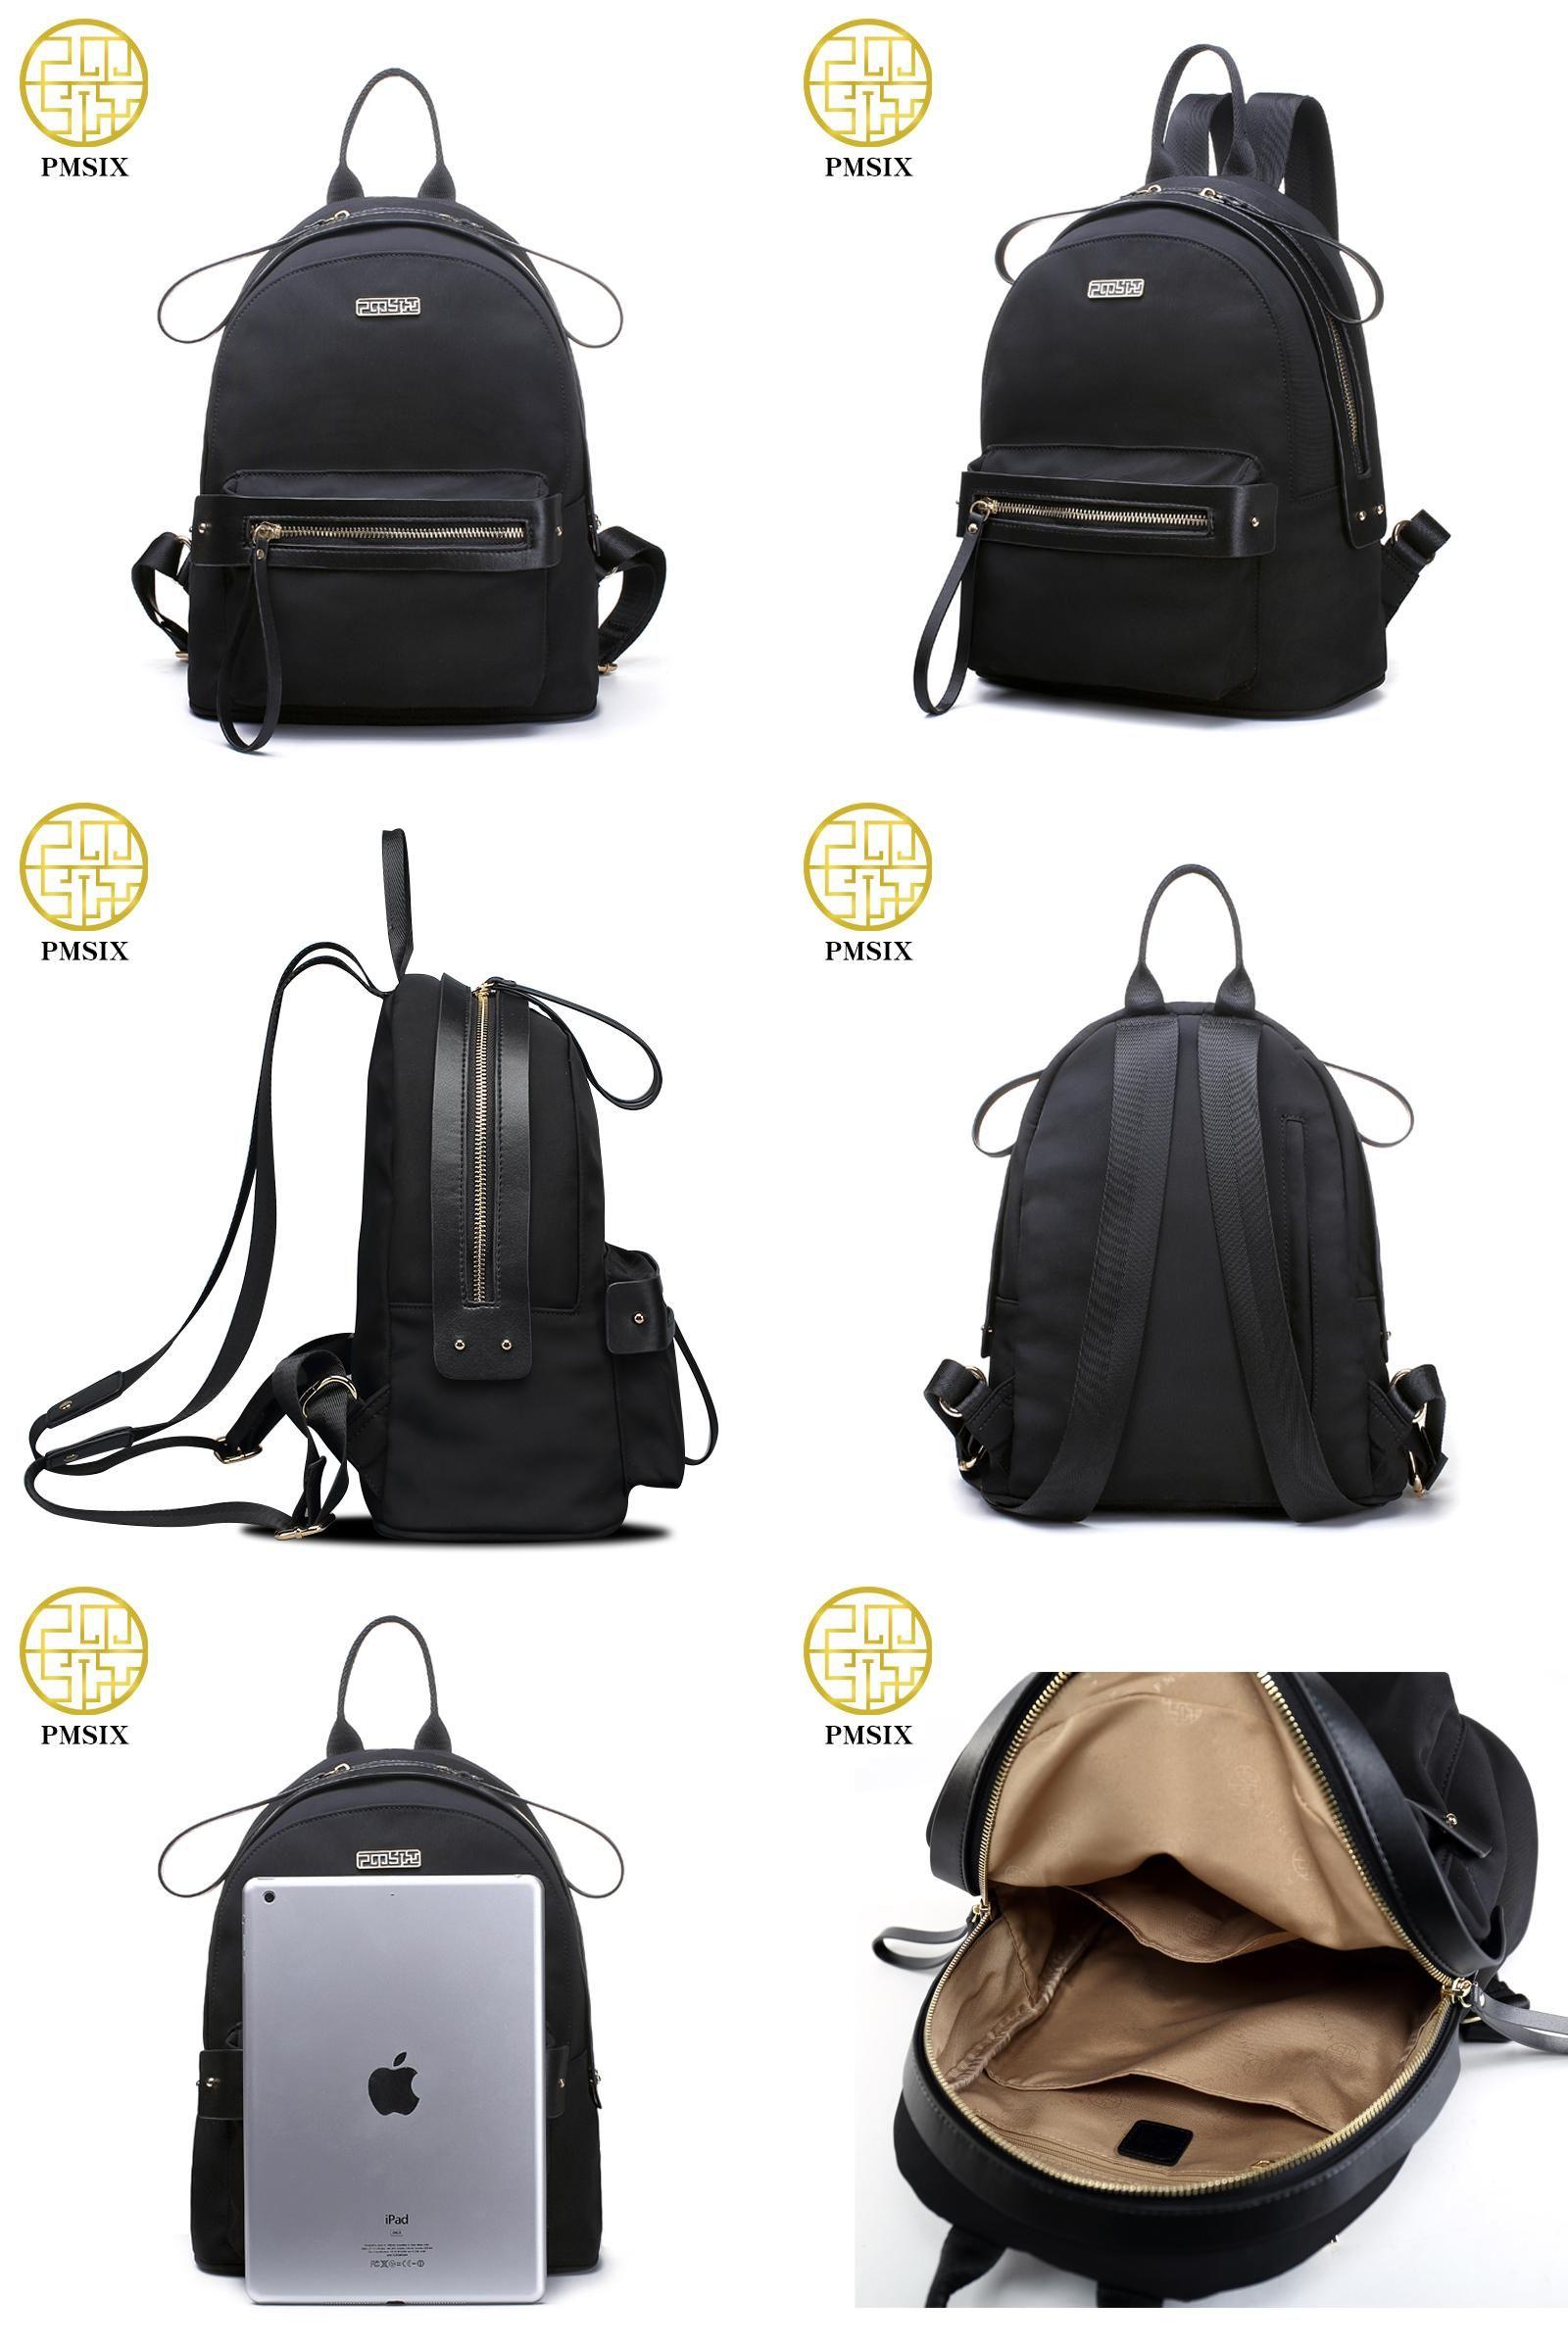 9521fa0d7b  Visit to Buy  PMSIX 2017 Autumn Winter New Women Black Backpack Waterproof  Fashion Travel